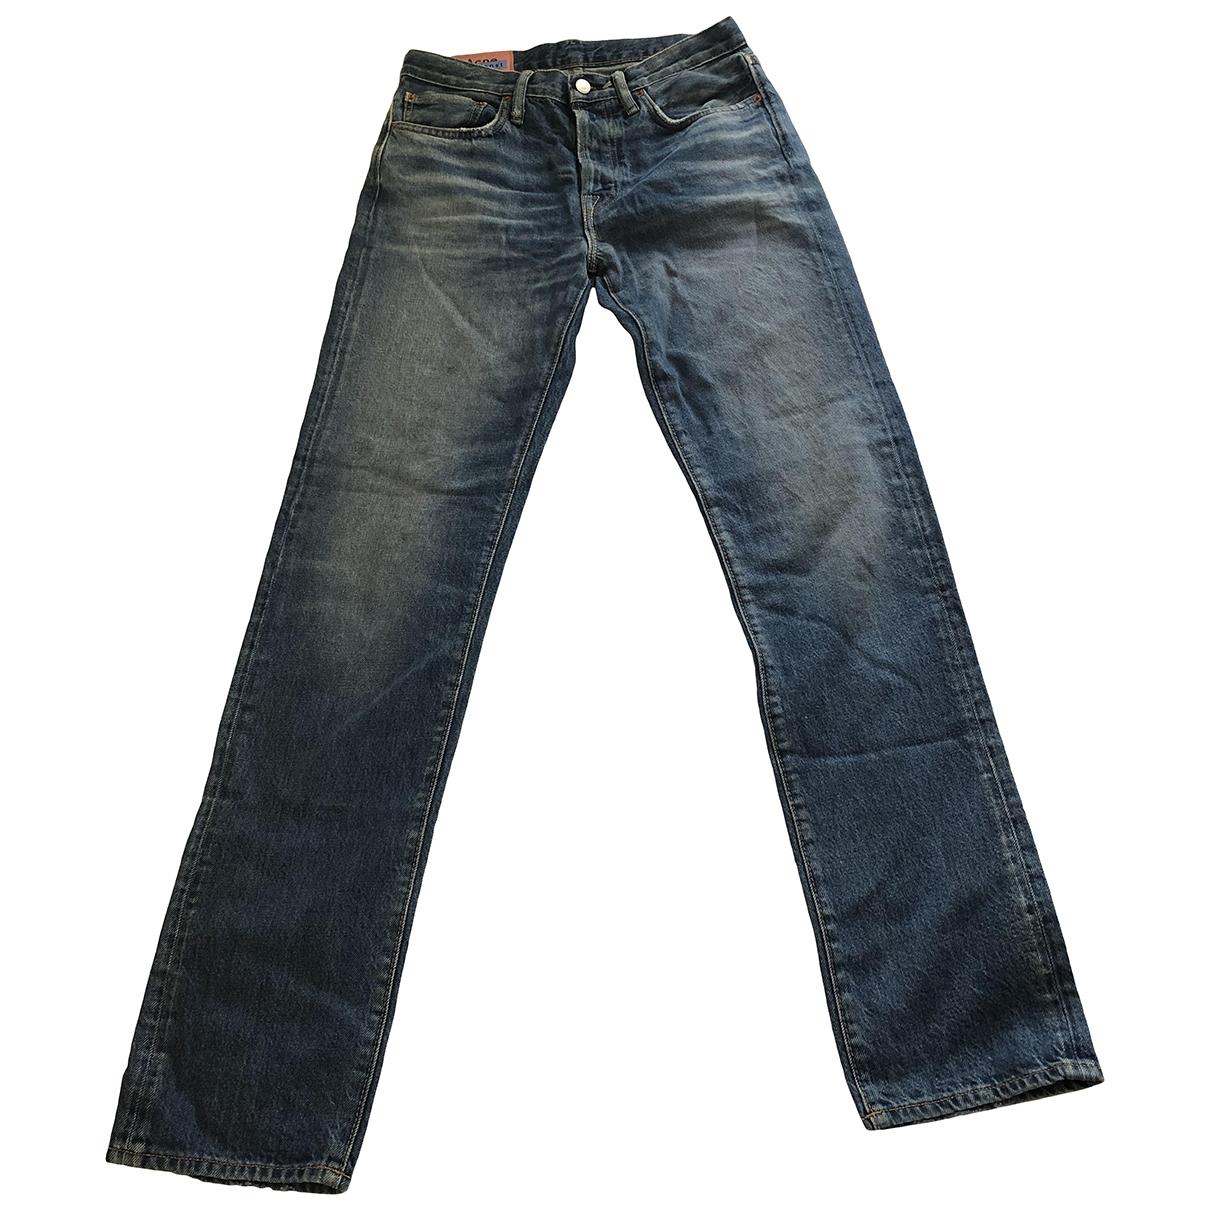 Acne Studios \N Blue Denim - Jeans Jeans for Women 38 FR